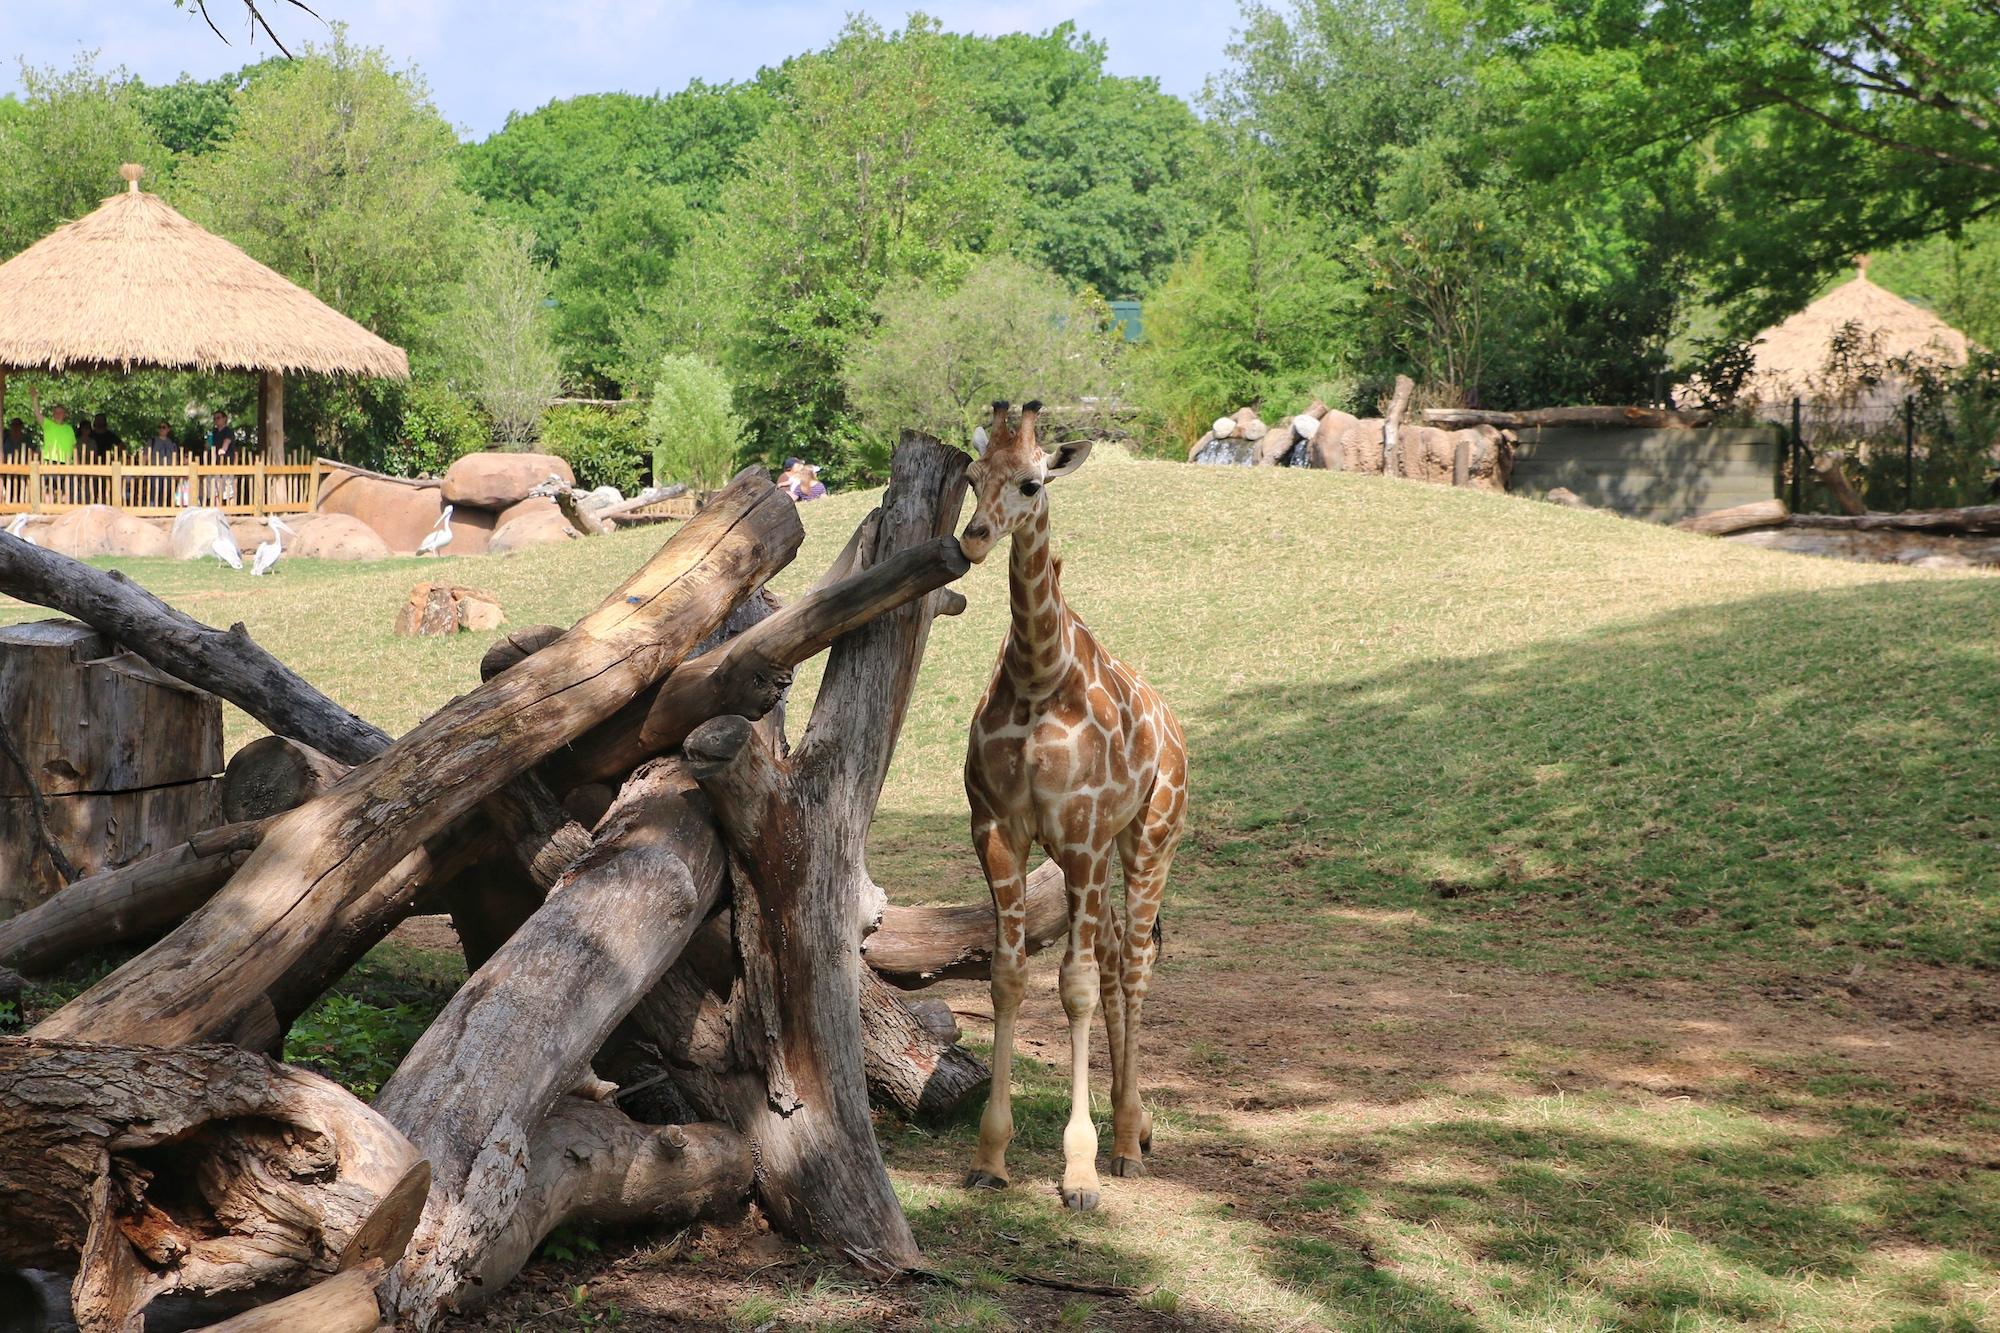 giraffe in habitat